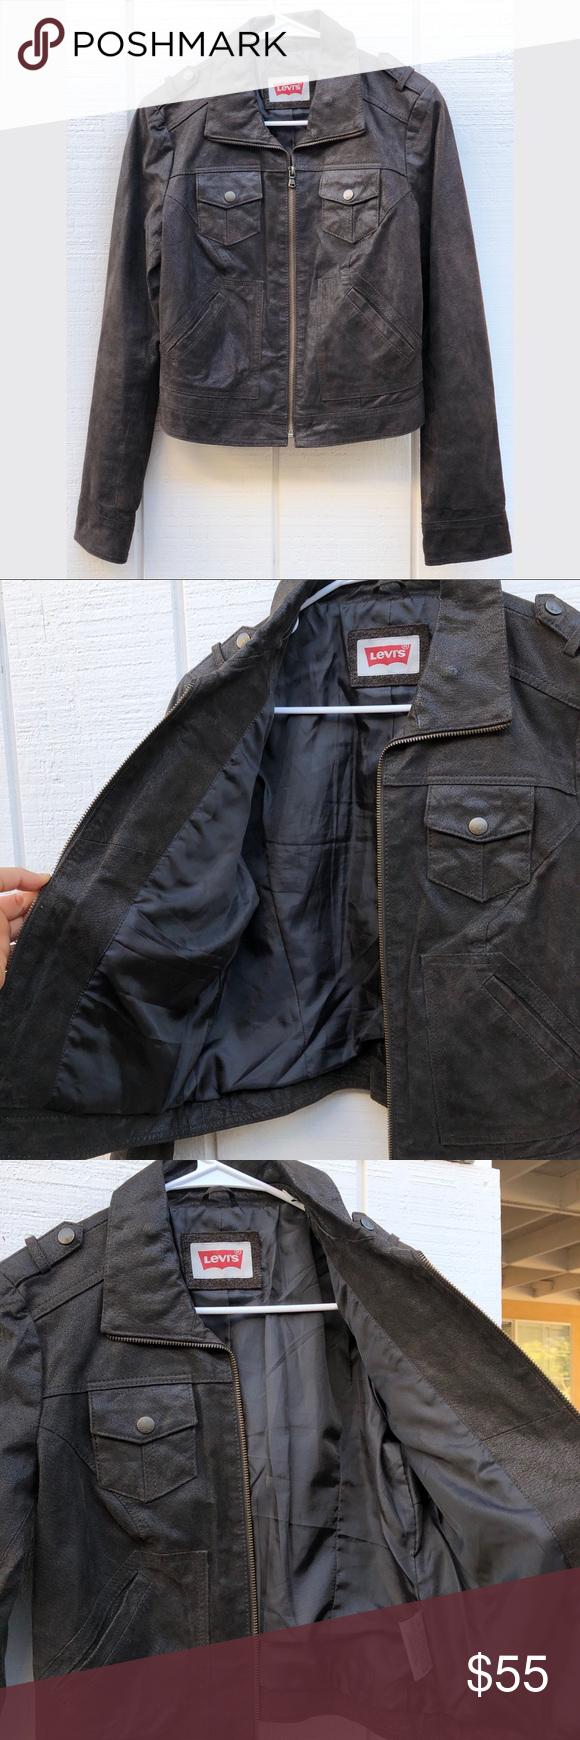 Like New Levi's Genuine Leather Jacket Clothes design